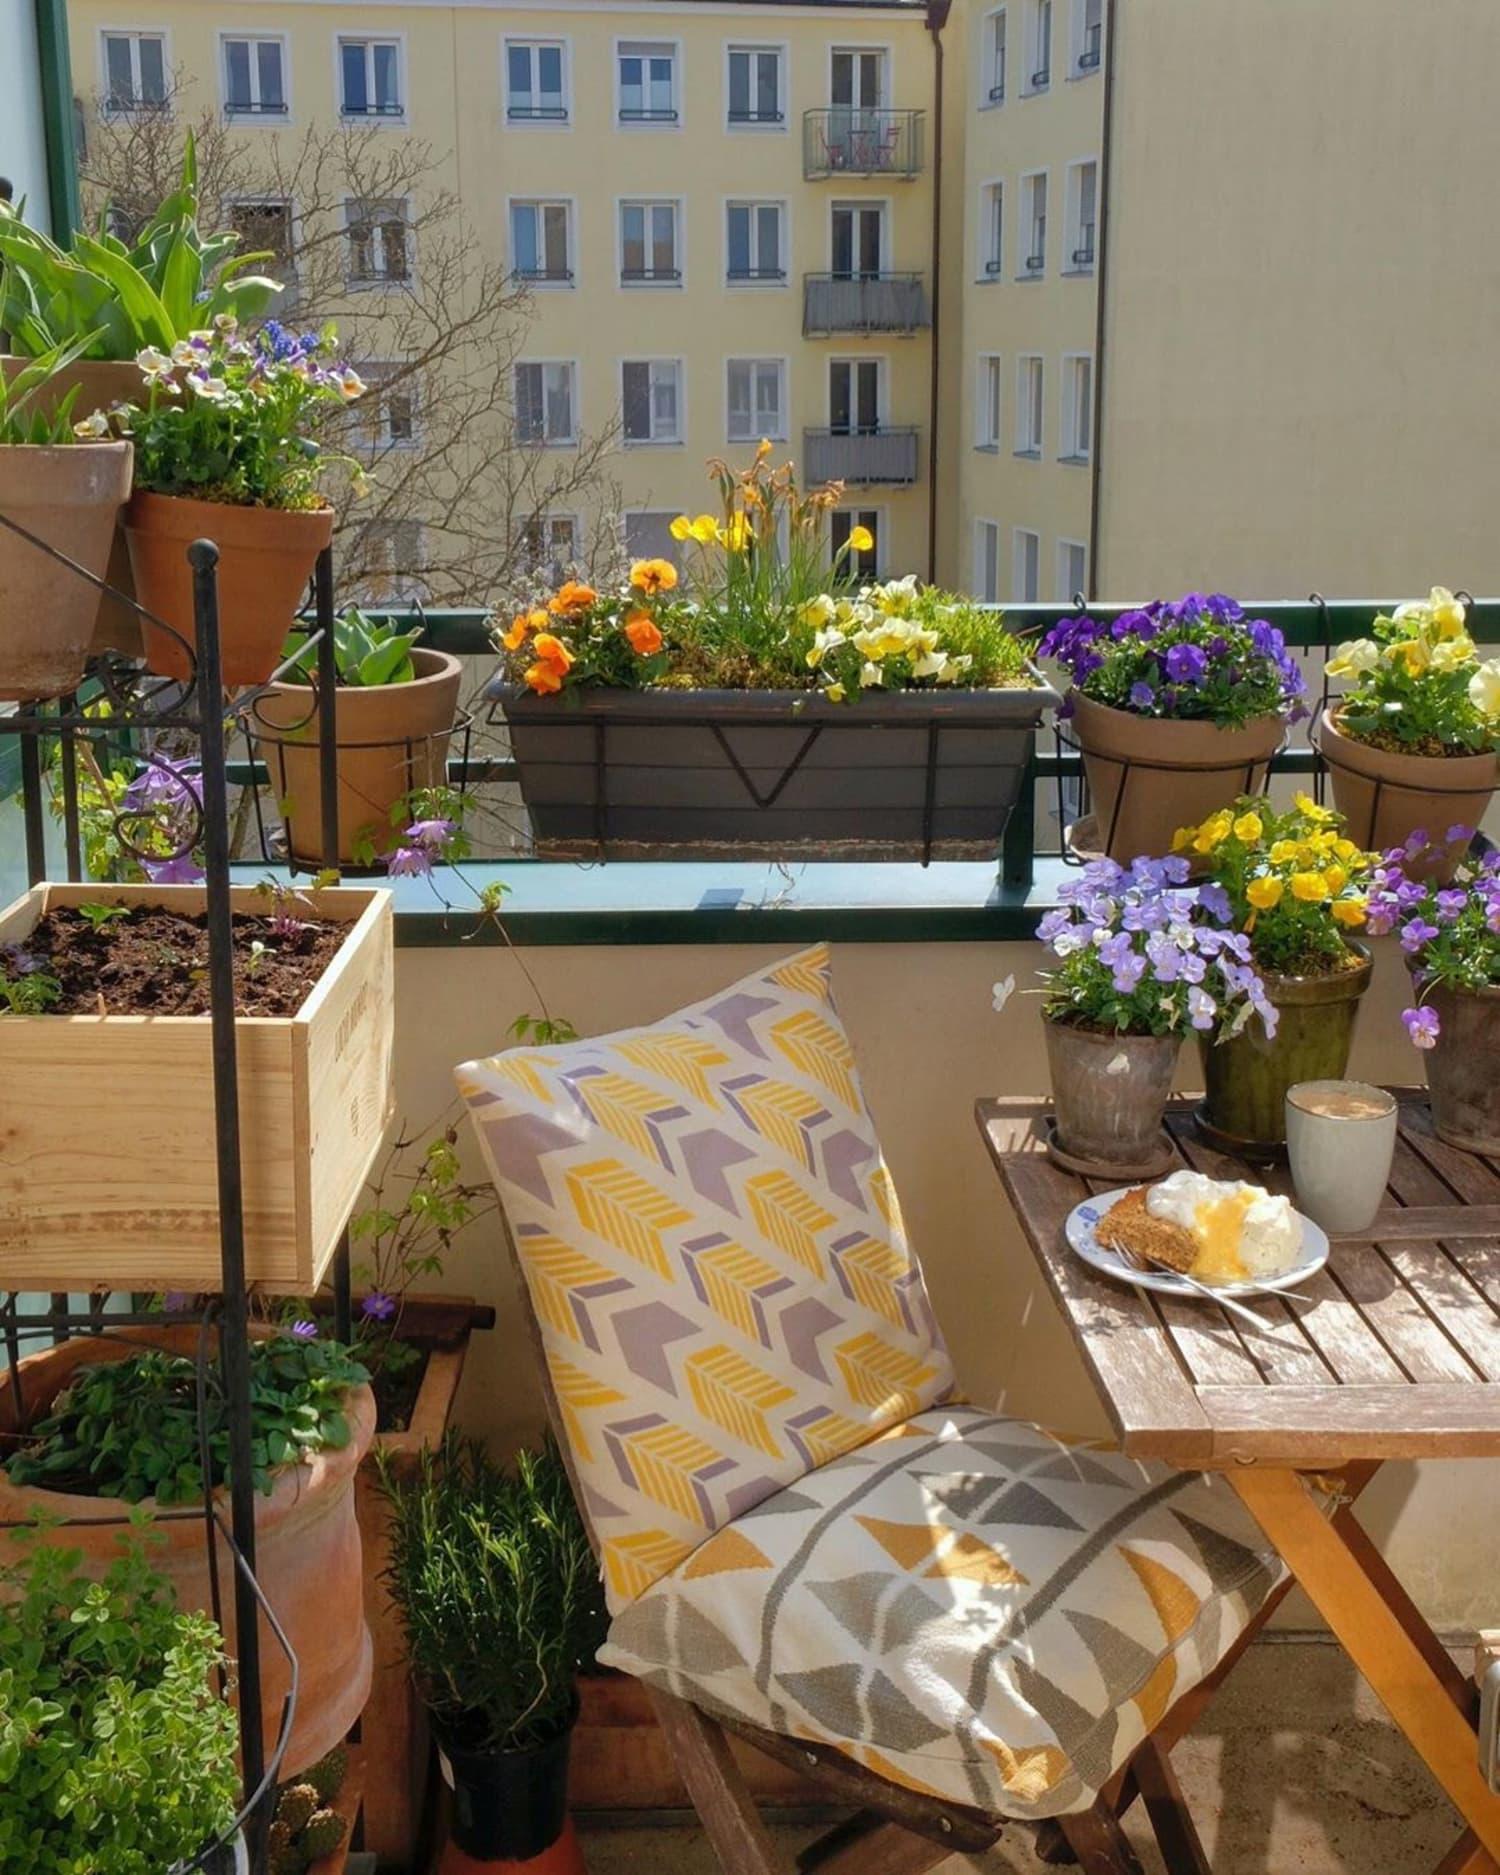 28 Balcony Garden Ideas - How to Grow Plants on a Small Balcony